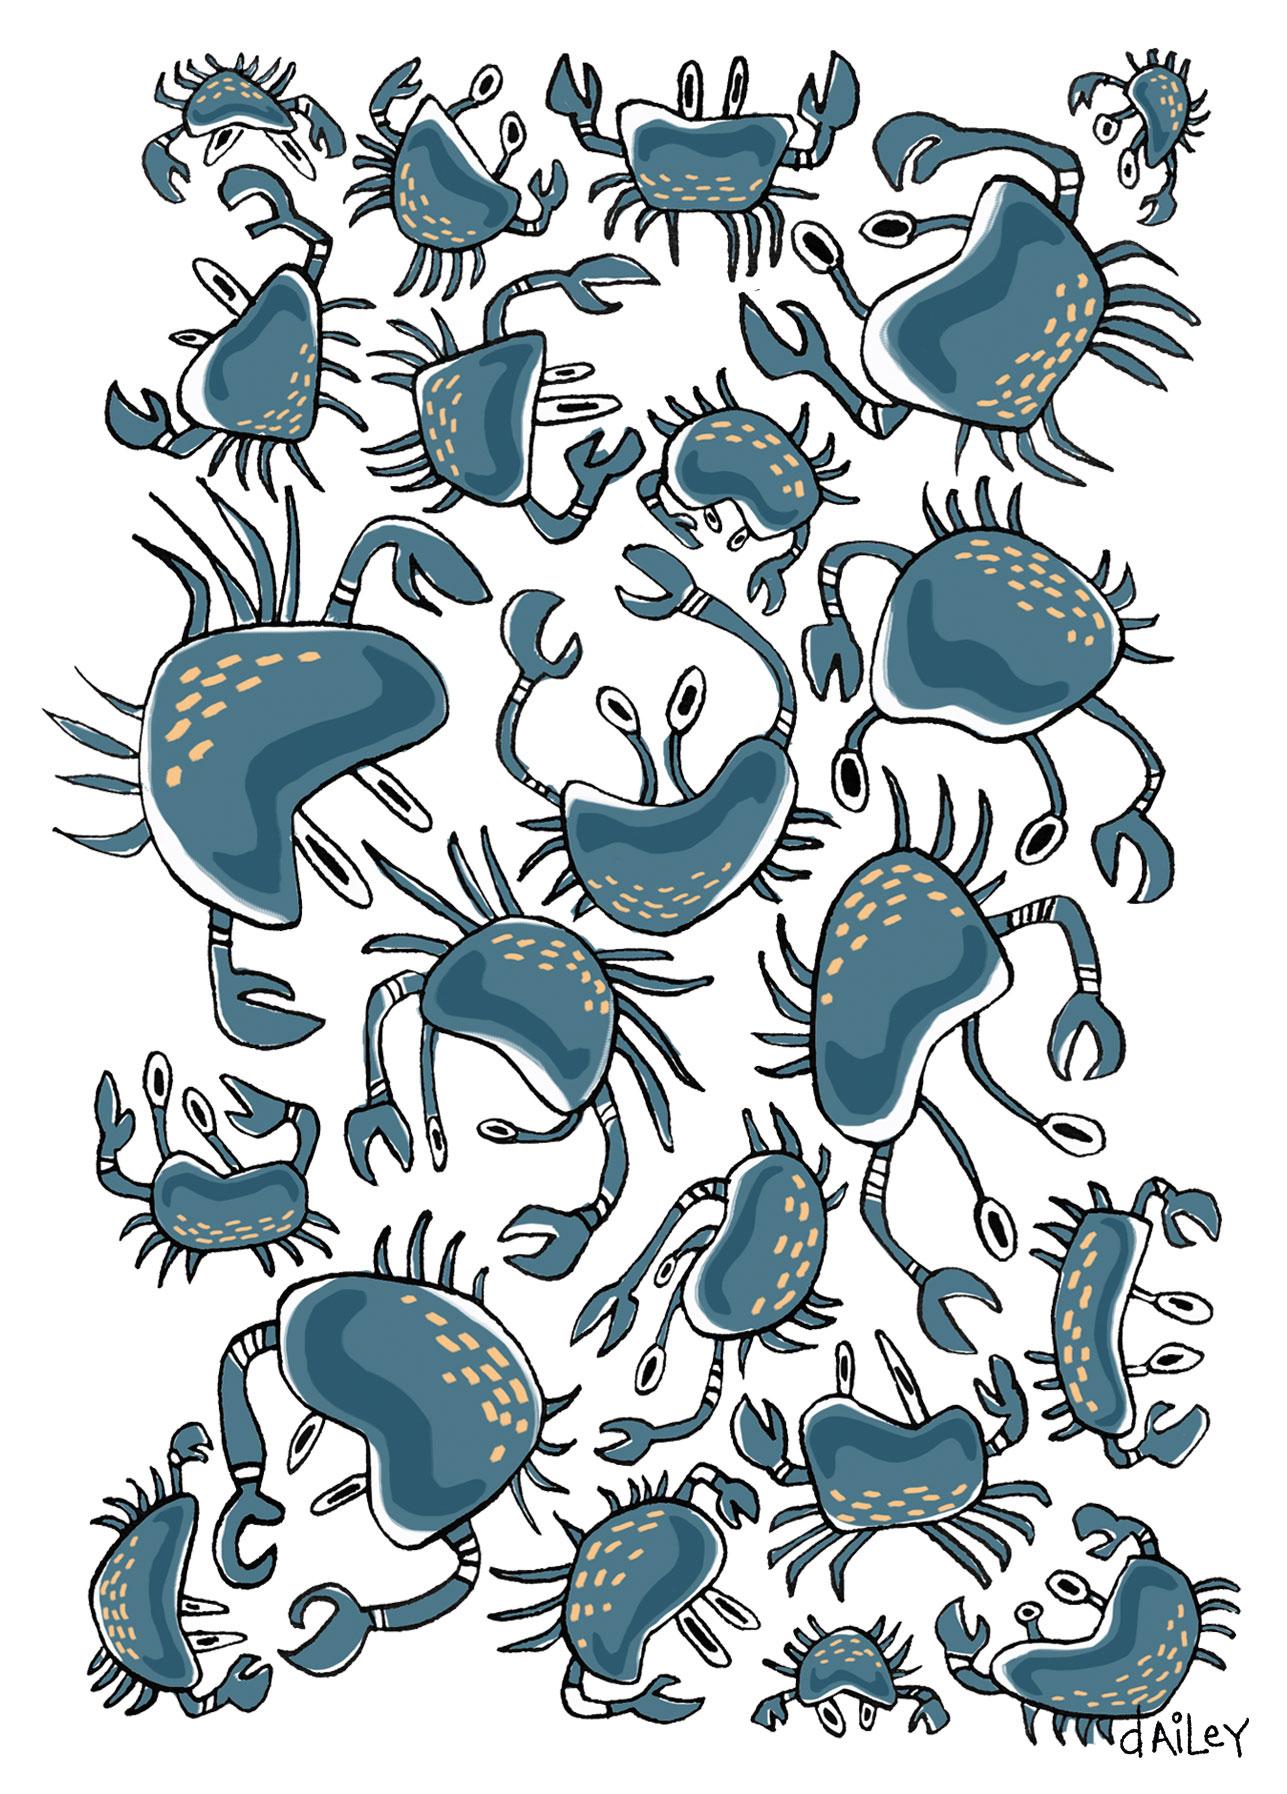 Crabs_CaitlynDailey.jpg